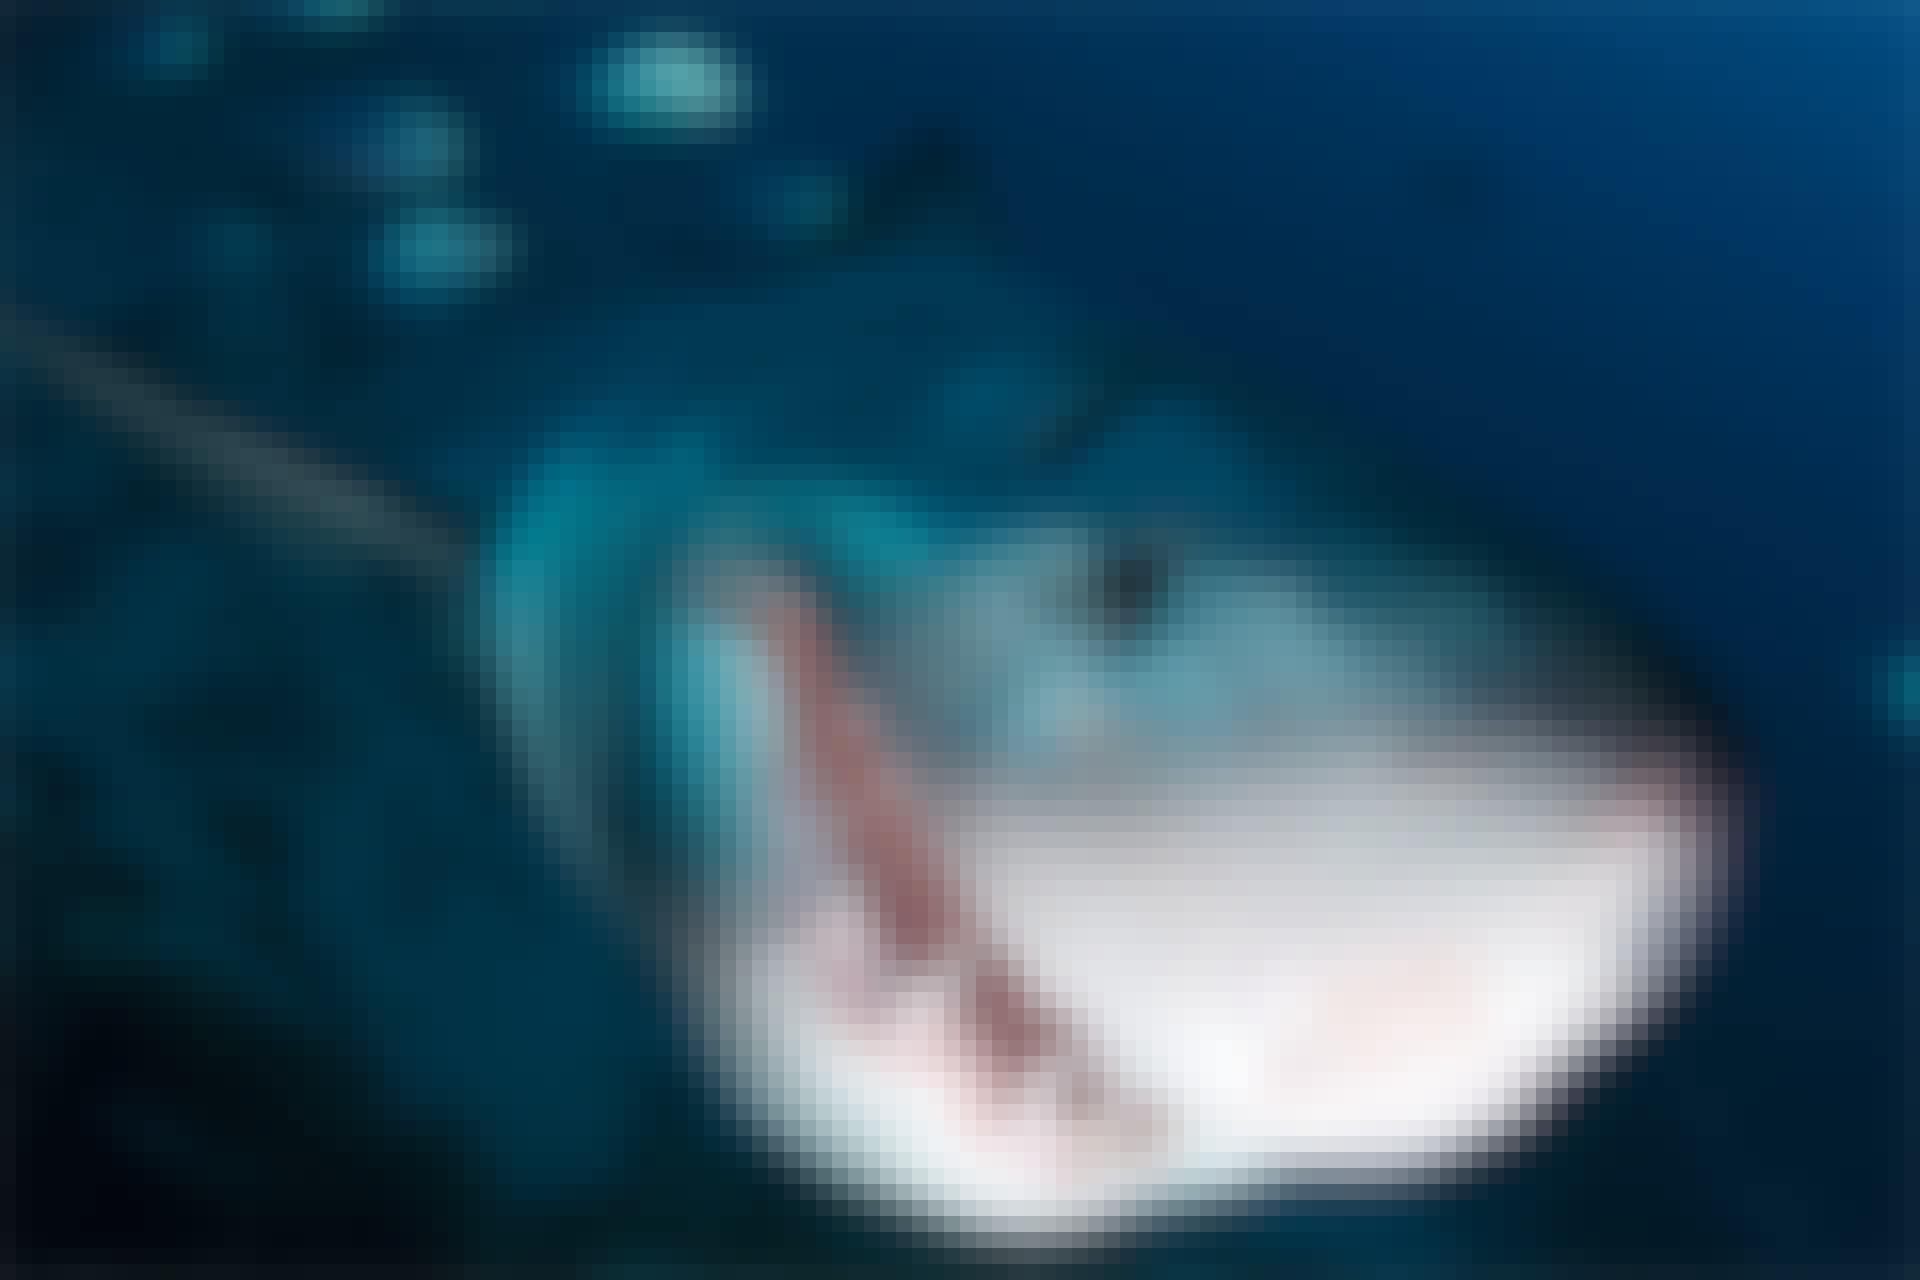 Jagande haj